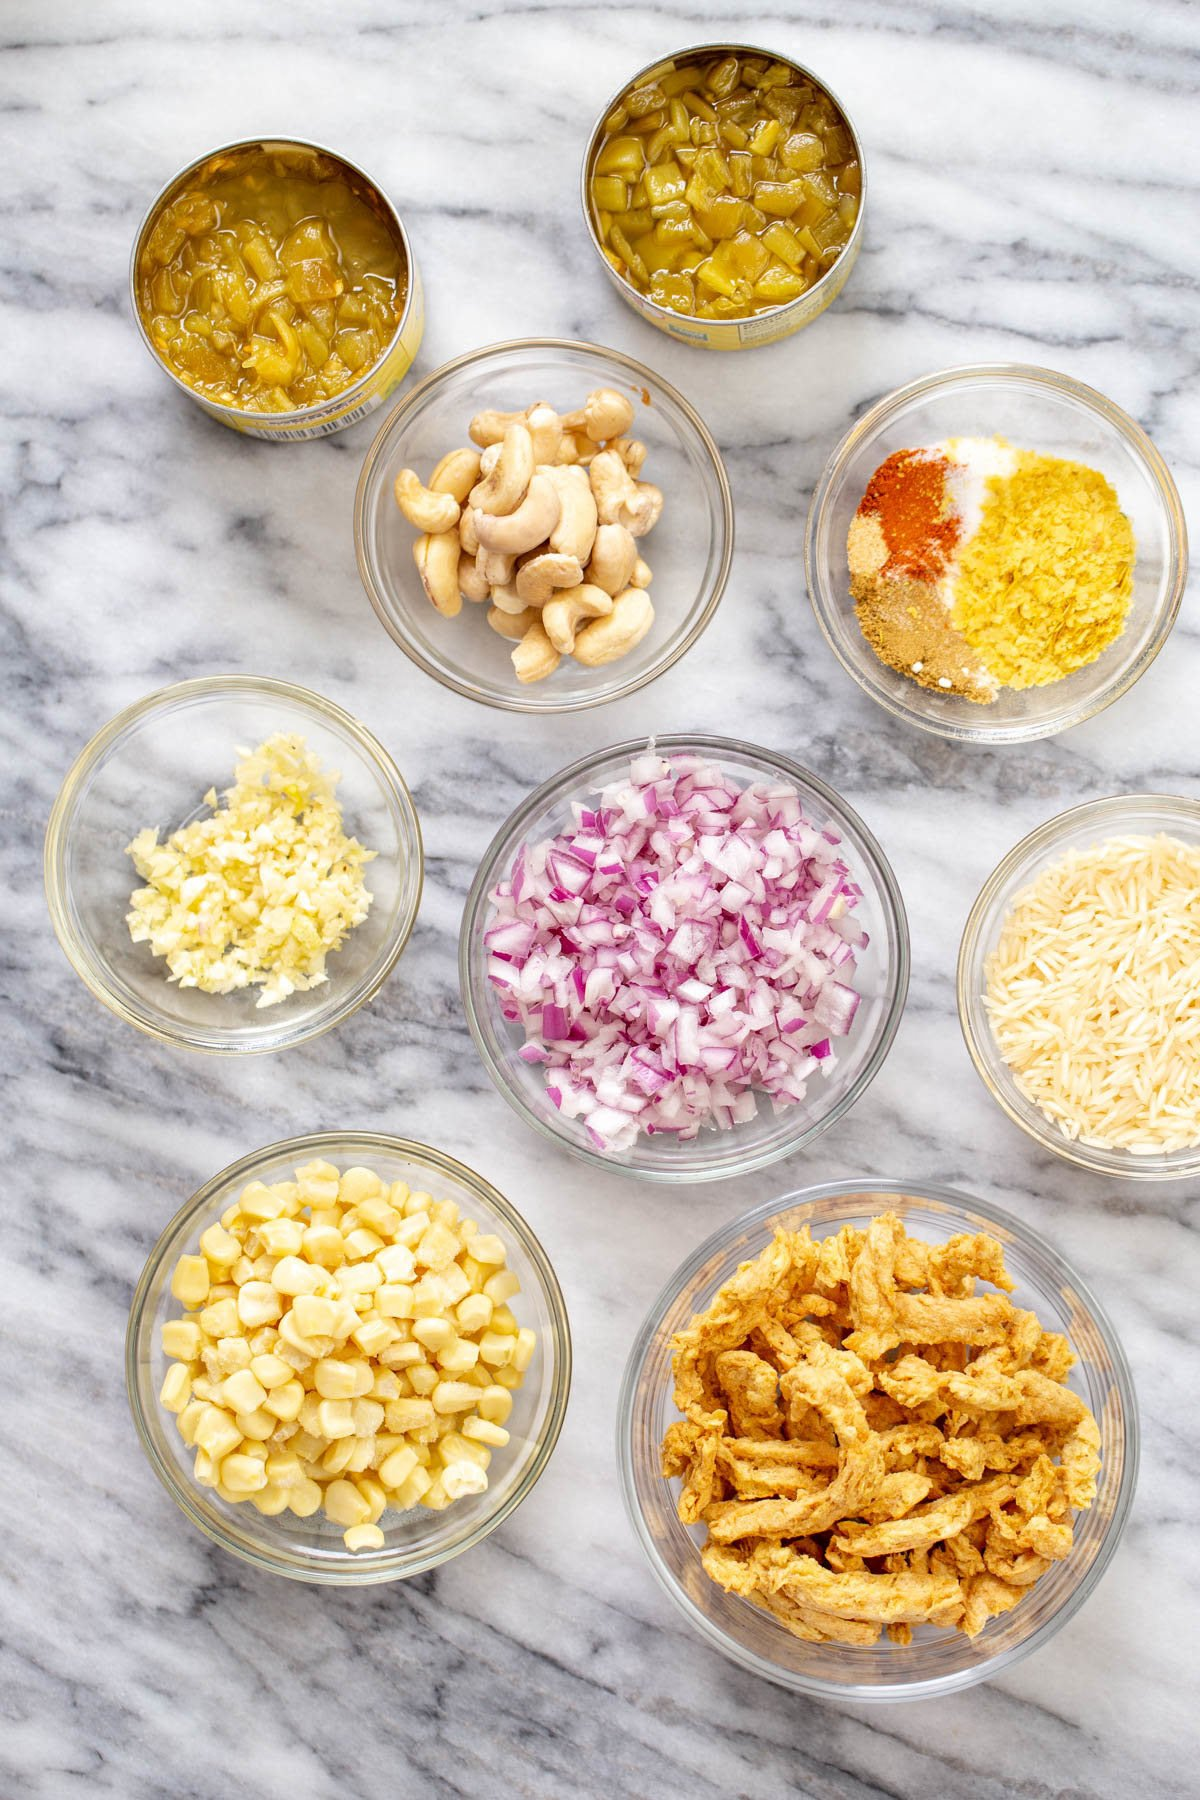 ingredients needed for making vegan enchilada soup